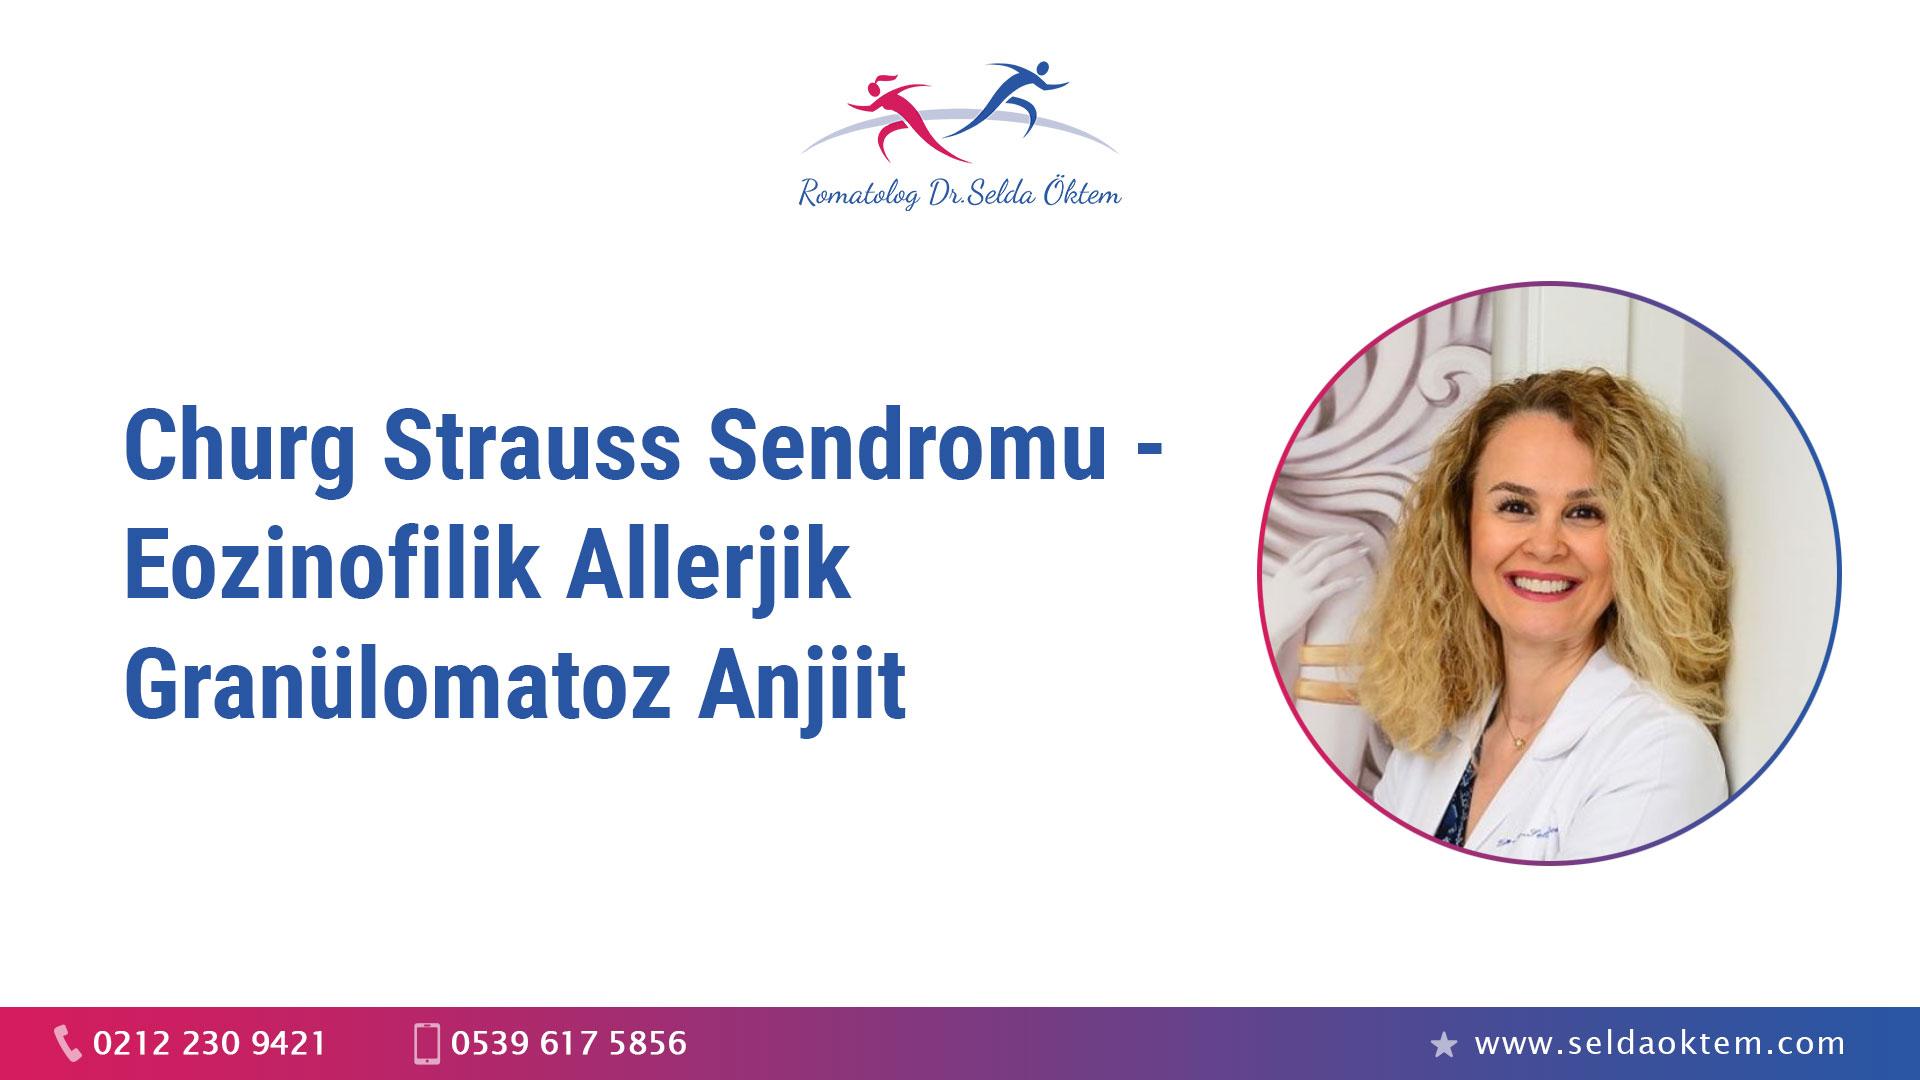 Churg Strauss Sendromu - Eozinofilik Allerjik granülomatoz anjiit